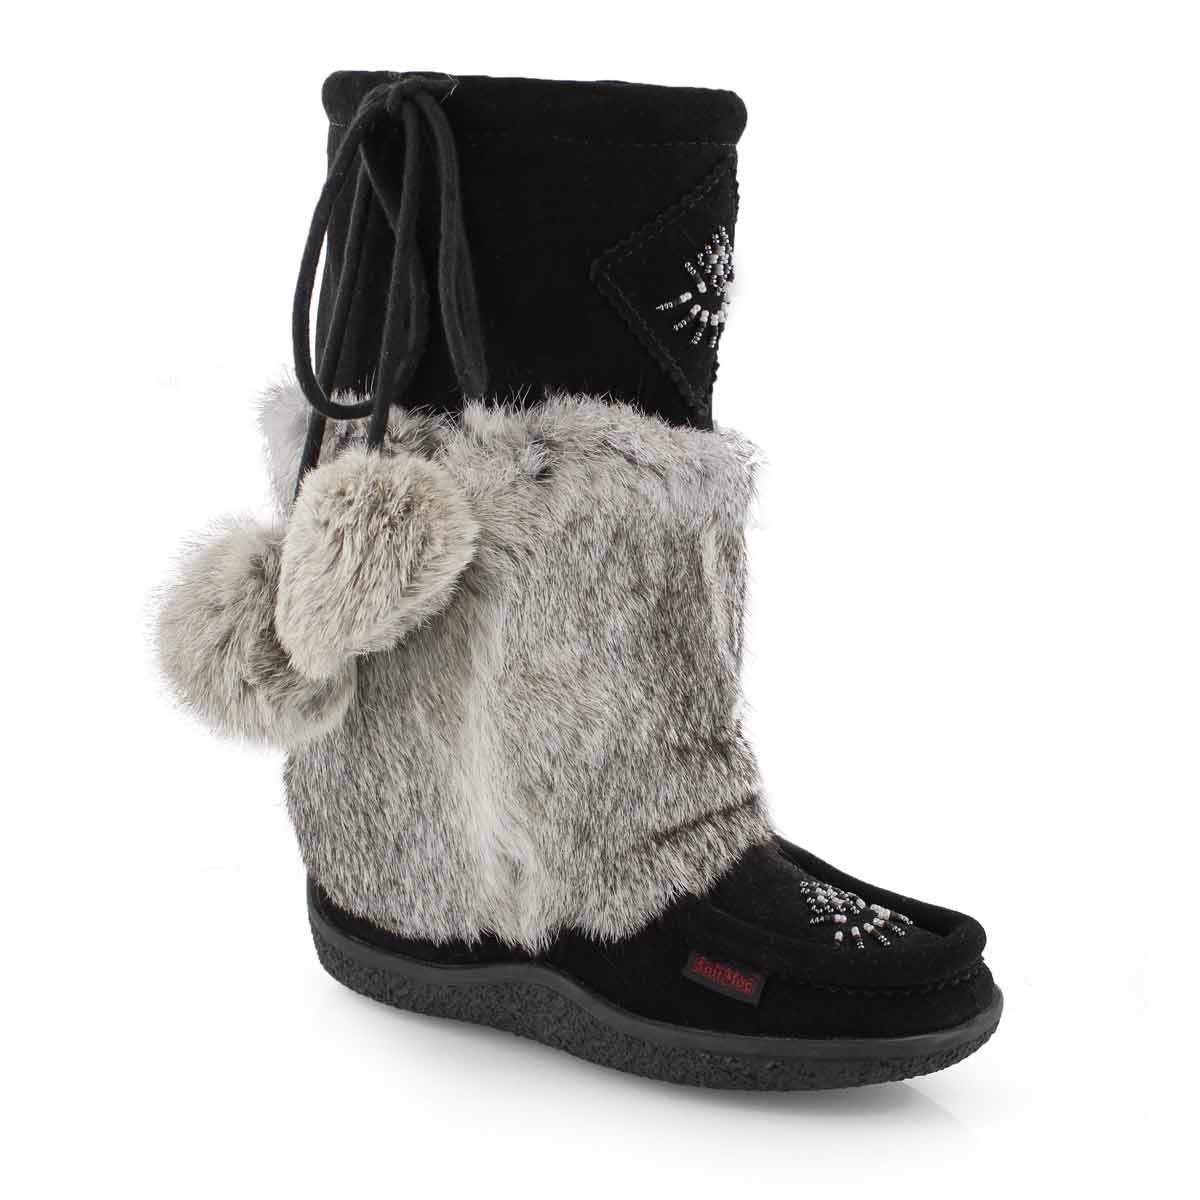 Lds Winter Niska black wtpf mukluk